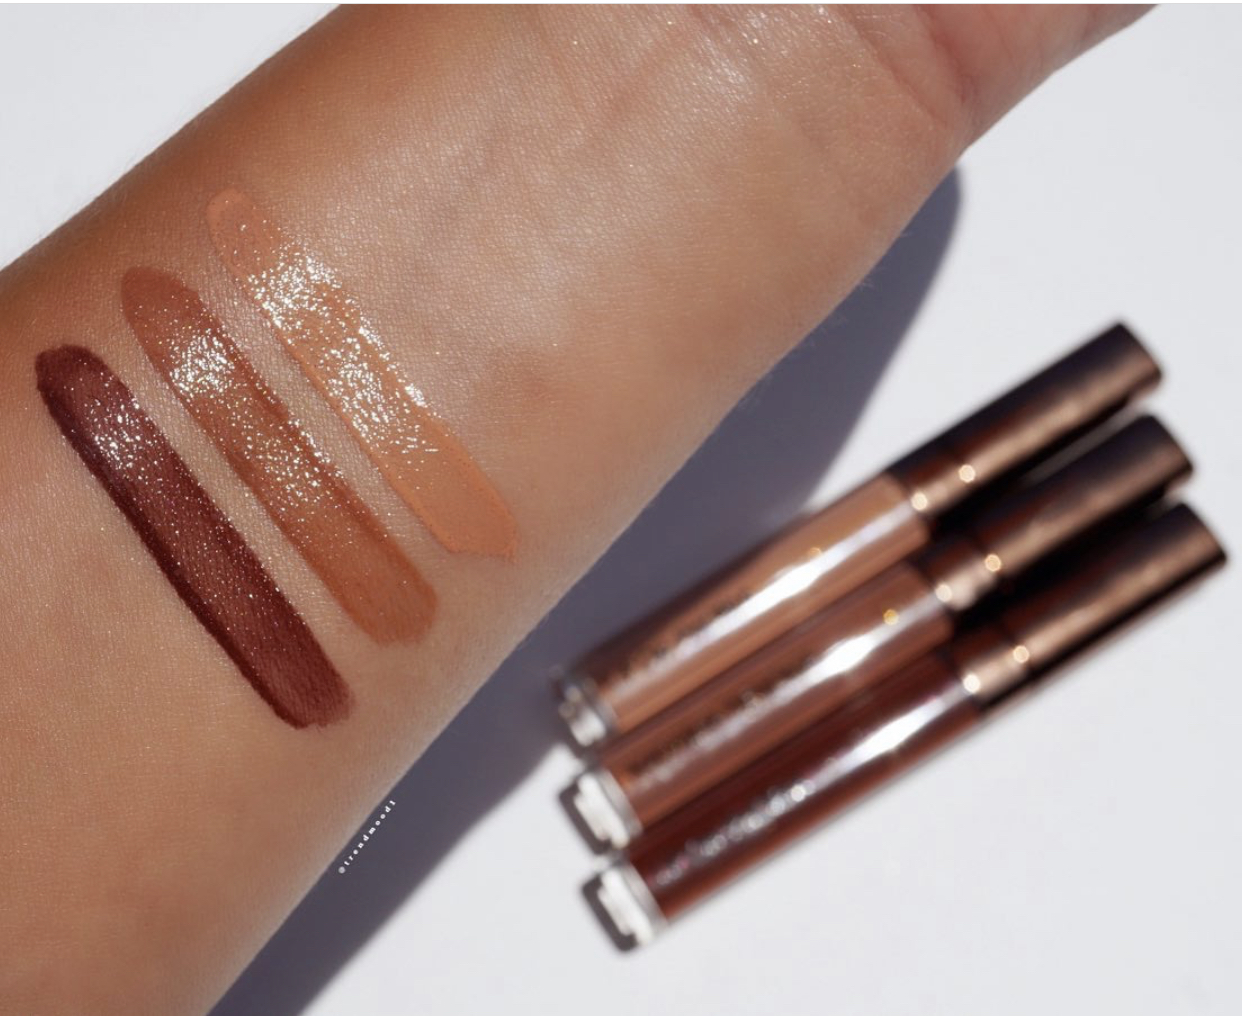 Natasha Denona Bronze Lip-Oh Phoria Gloss & Balm Collection